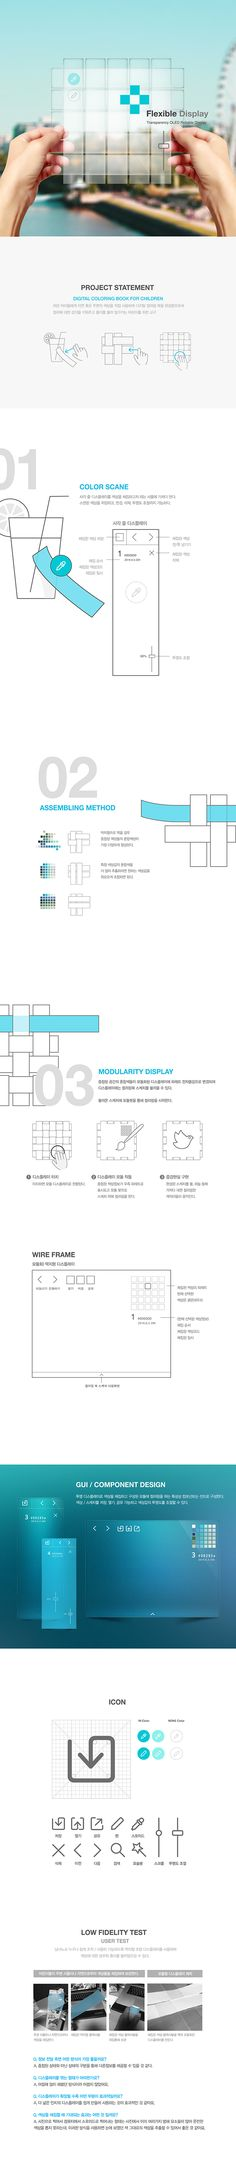 Woosung_Jeon | Flexible OLED Display Module | Visual Interface Design(2) 2016 | Major in Digital Media Design │#hicoda │hicoda.hongik.ac.kr